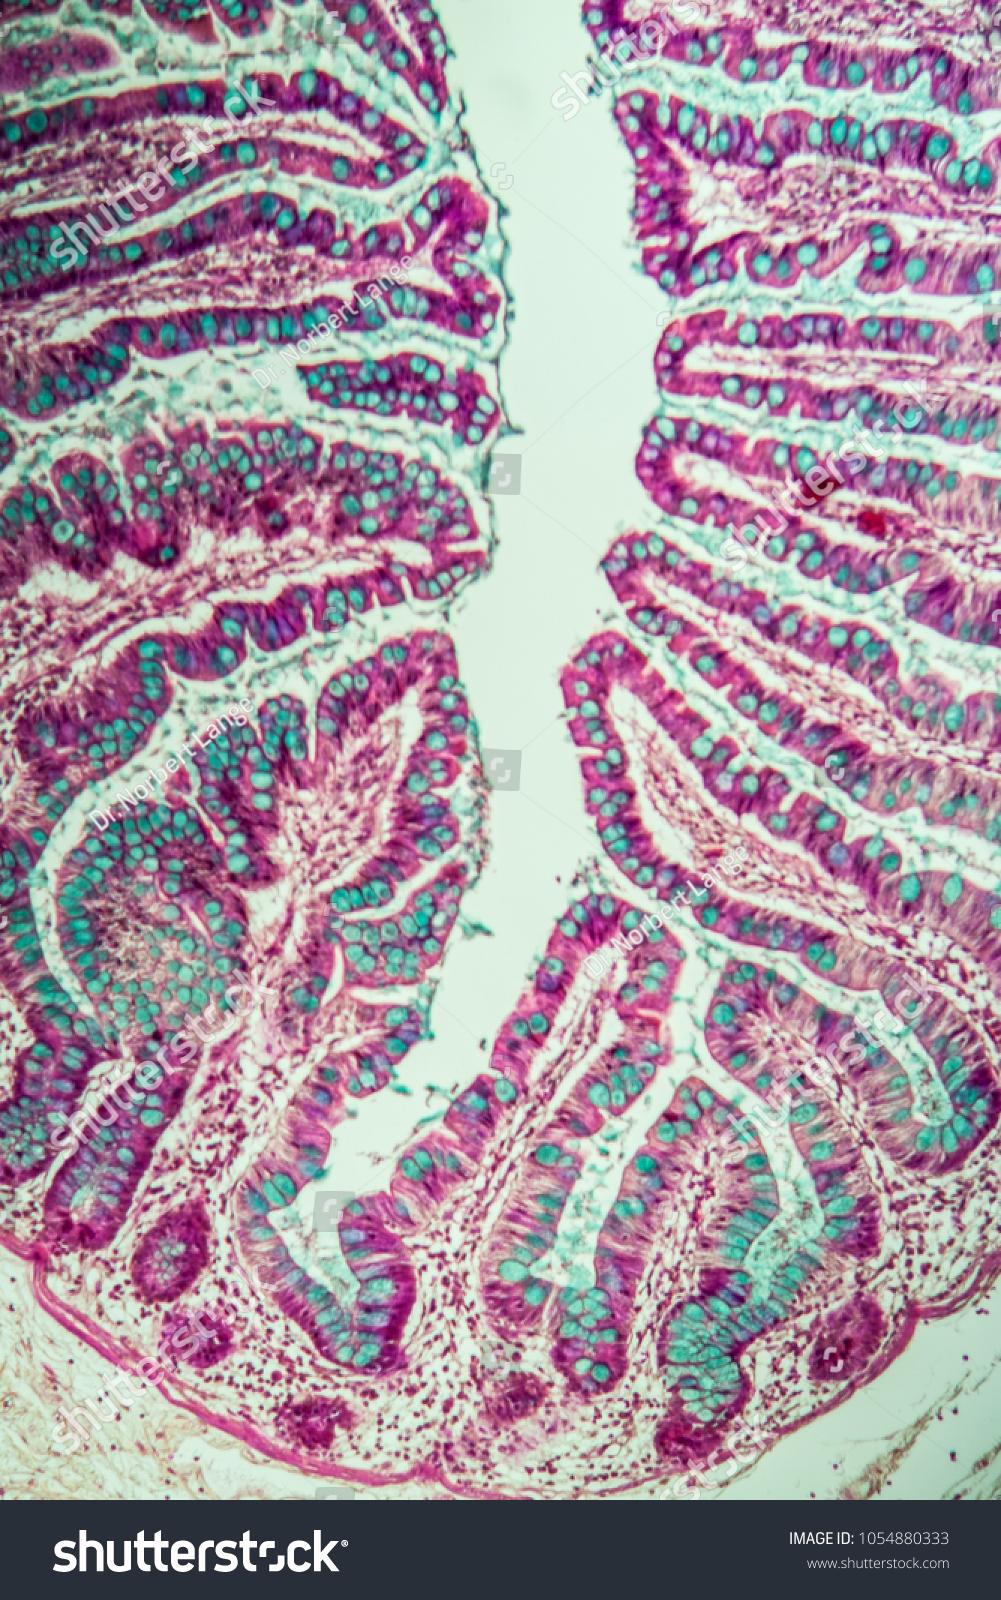 Small Intestine Intestinal Villi Under Microscope Stock Photo Edit